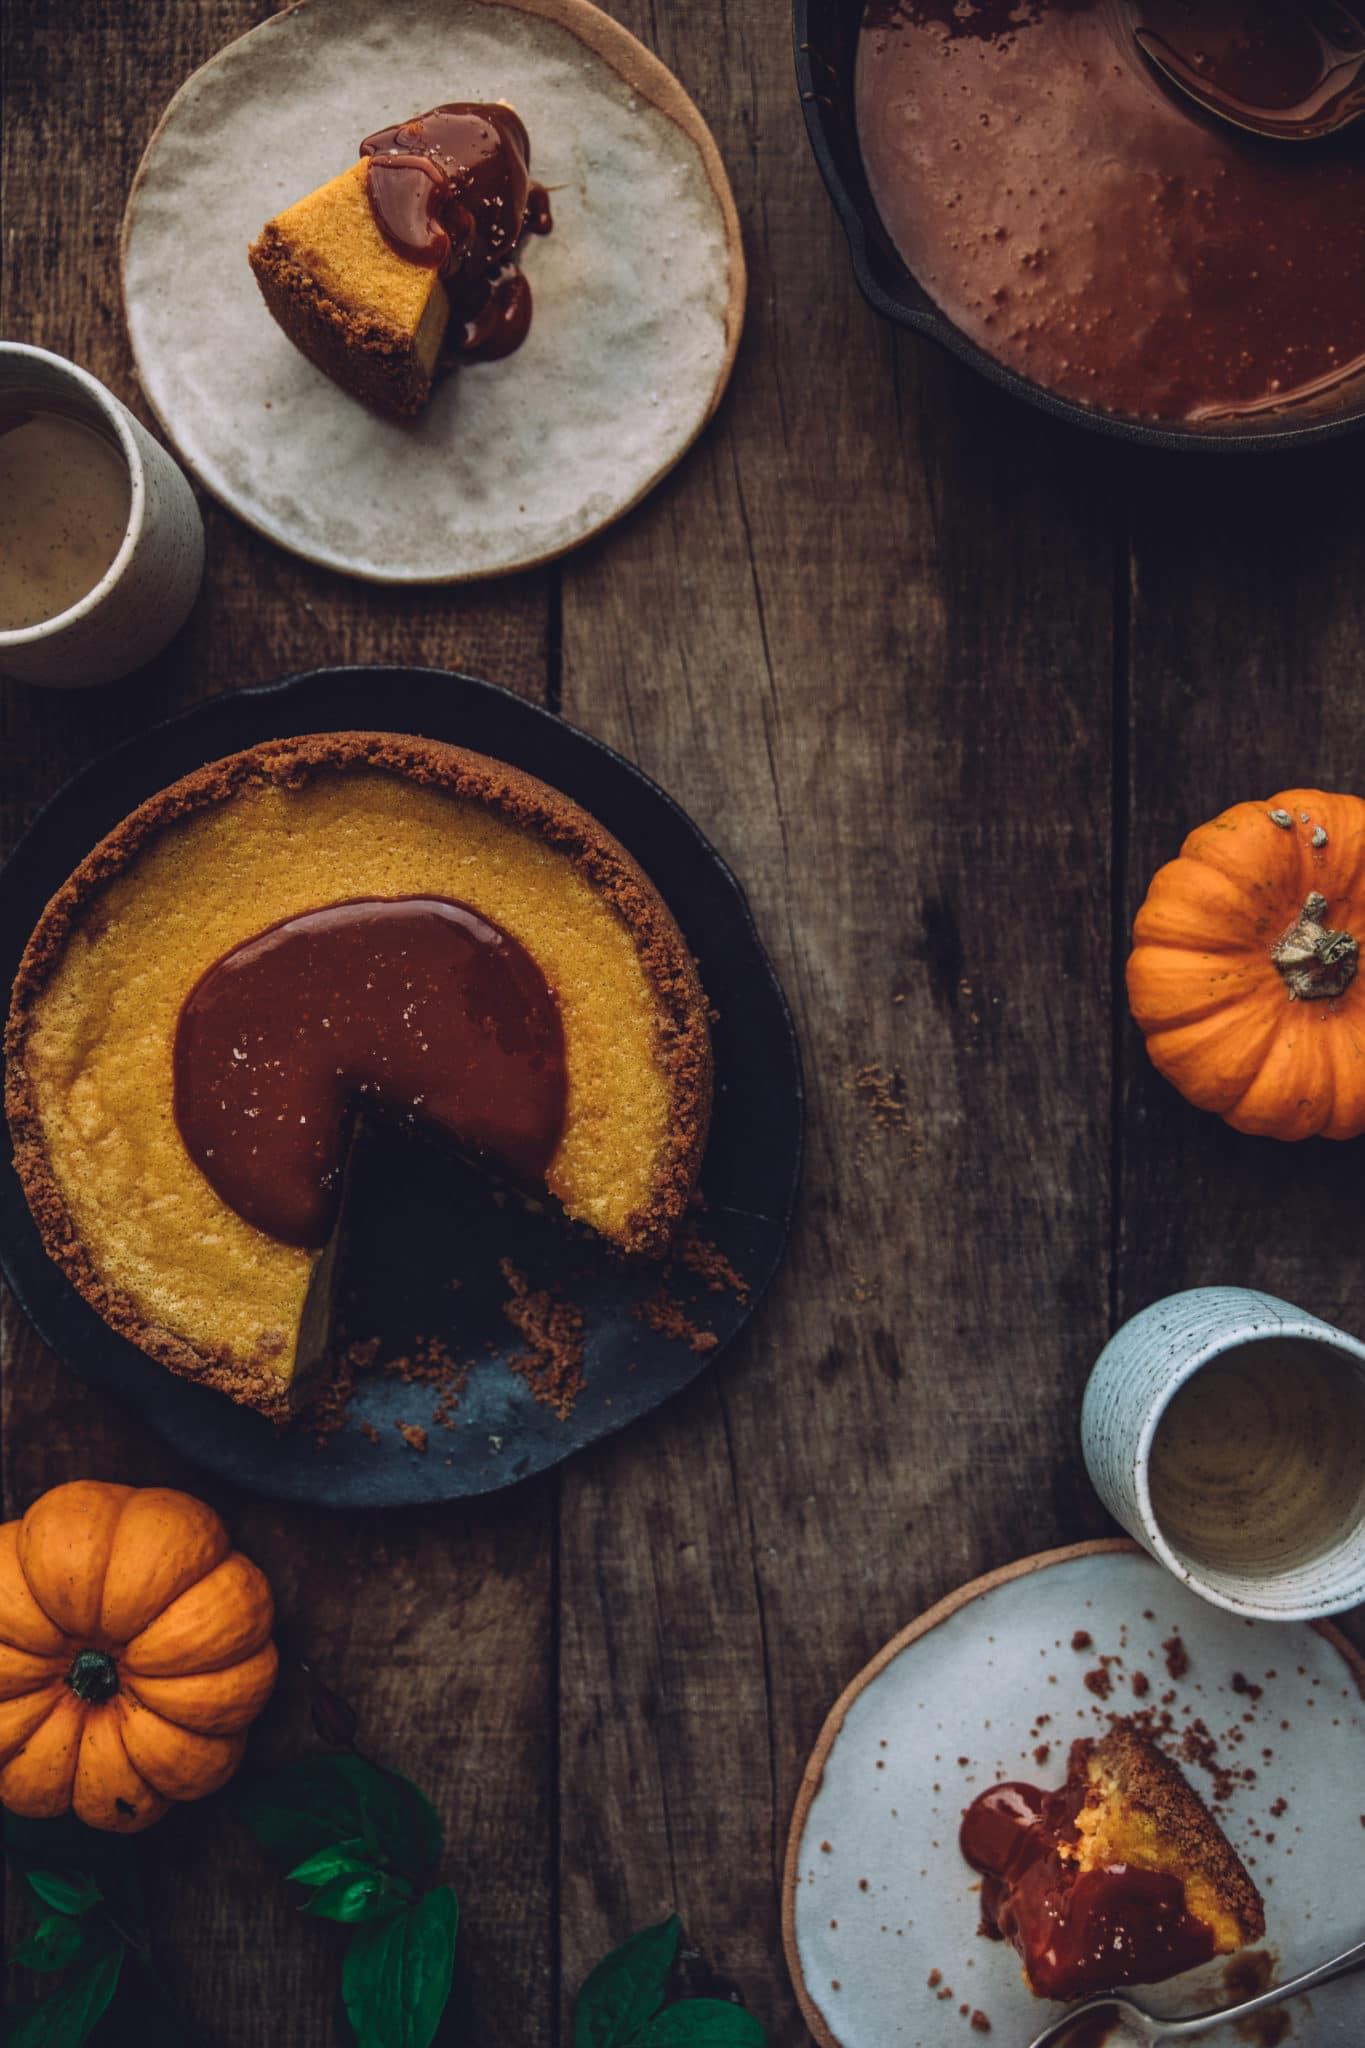 cheesecake potiron Mégane Ardérighi megandcook styliste culinaire